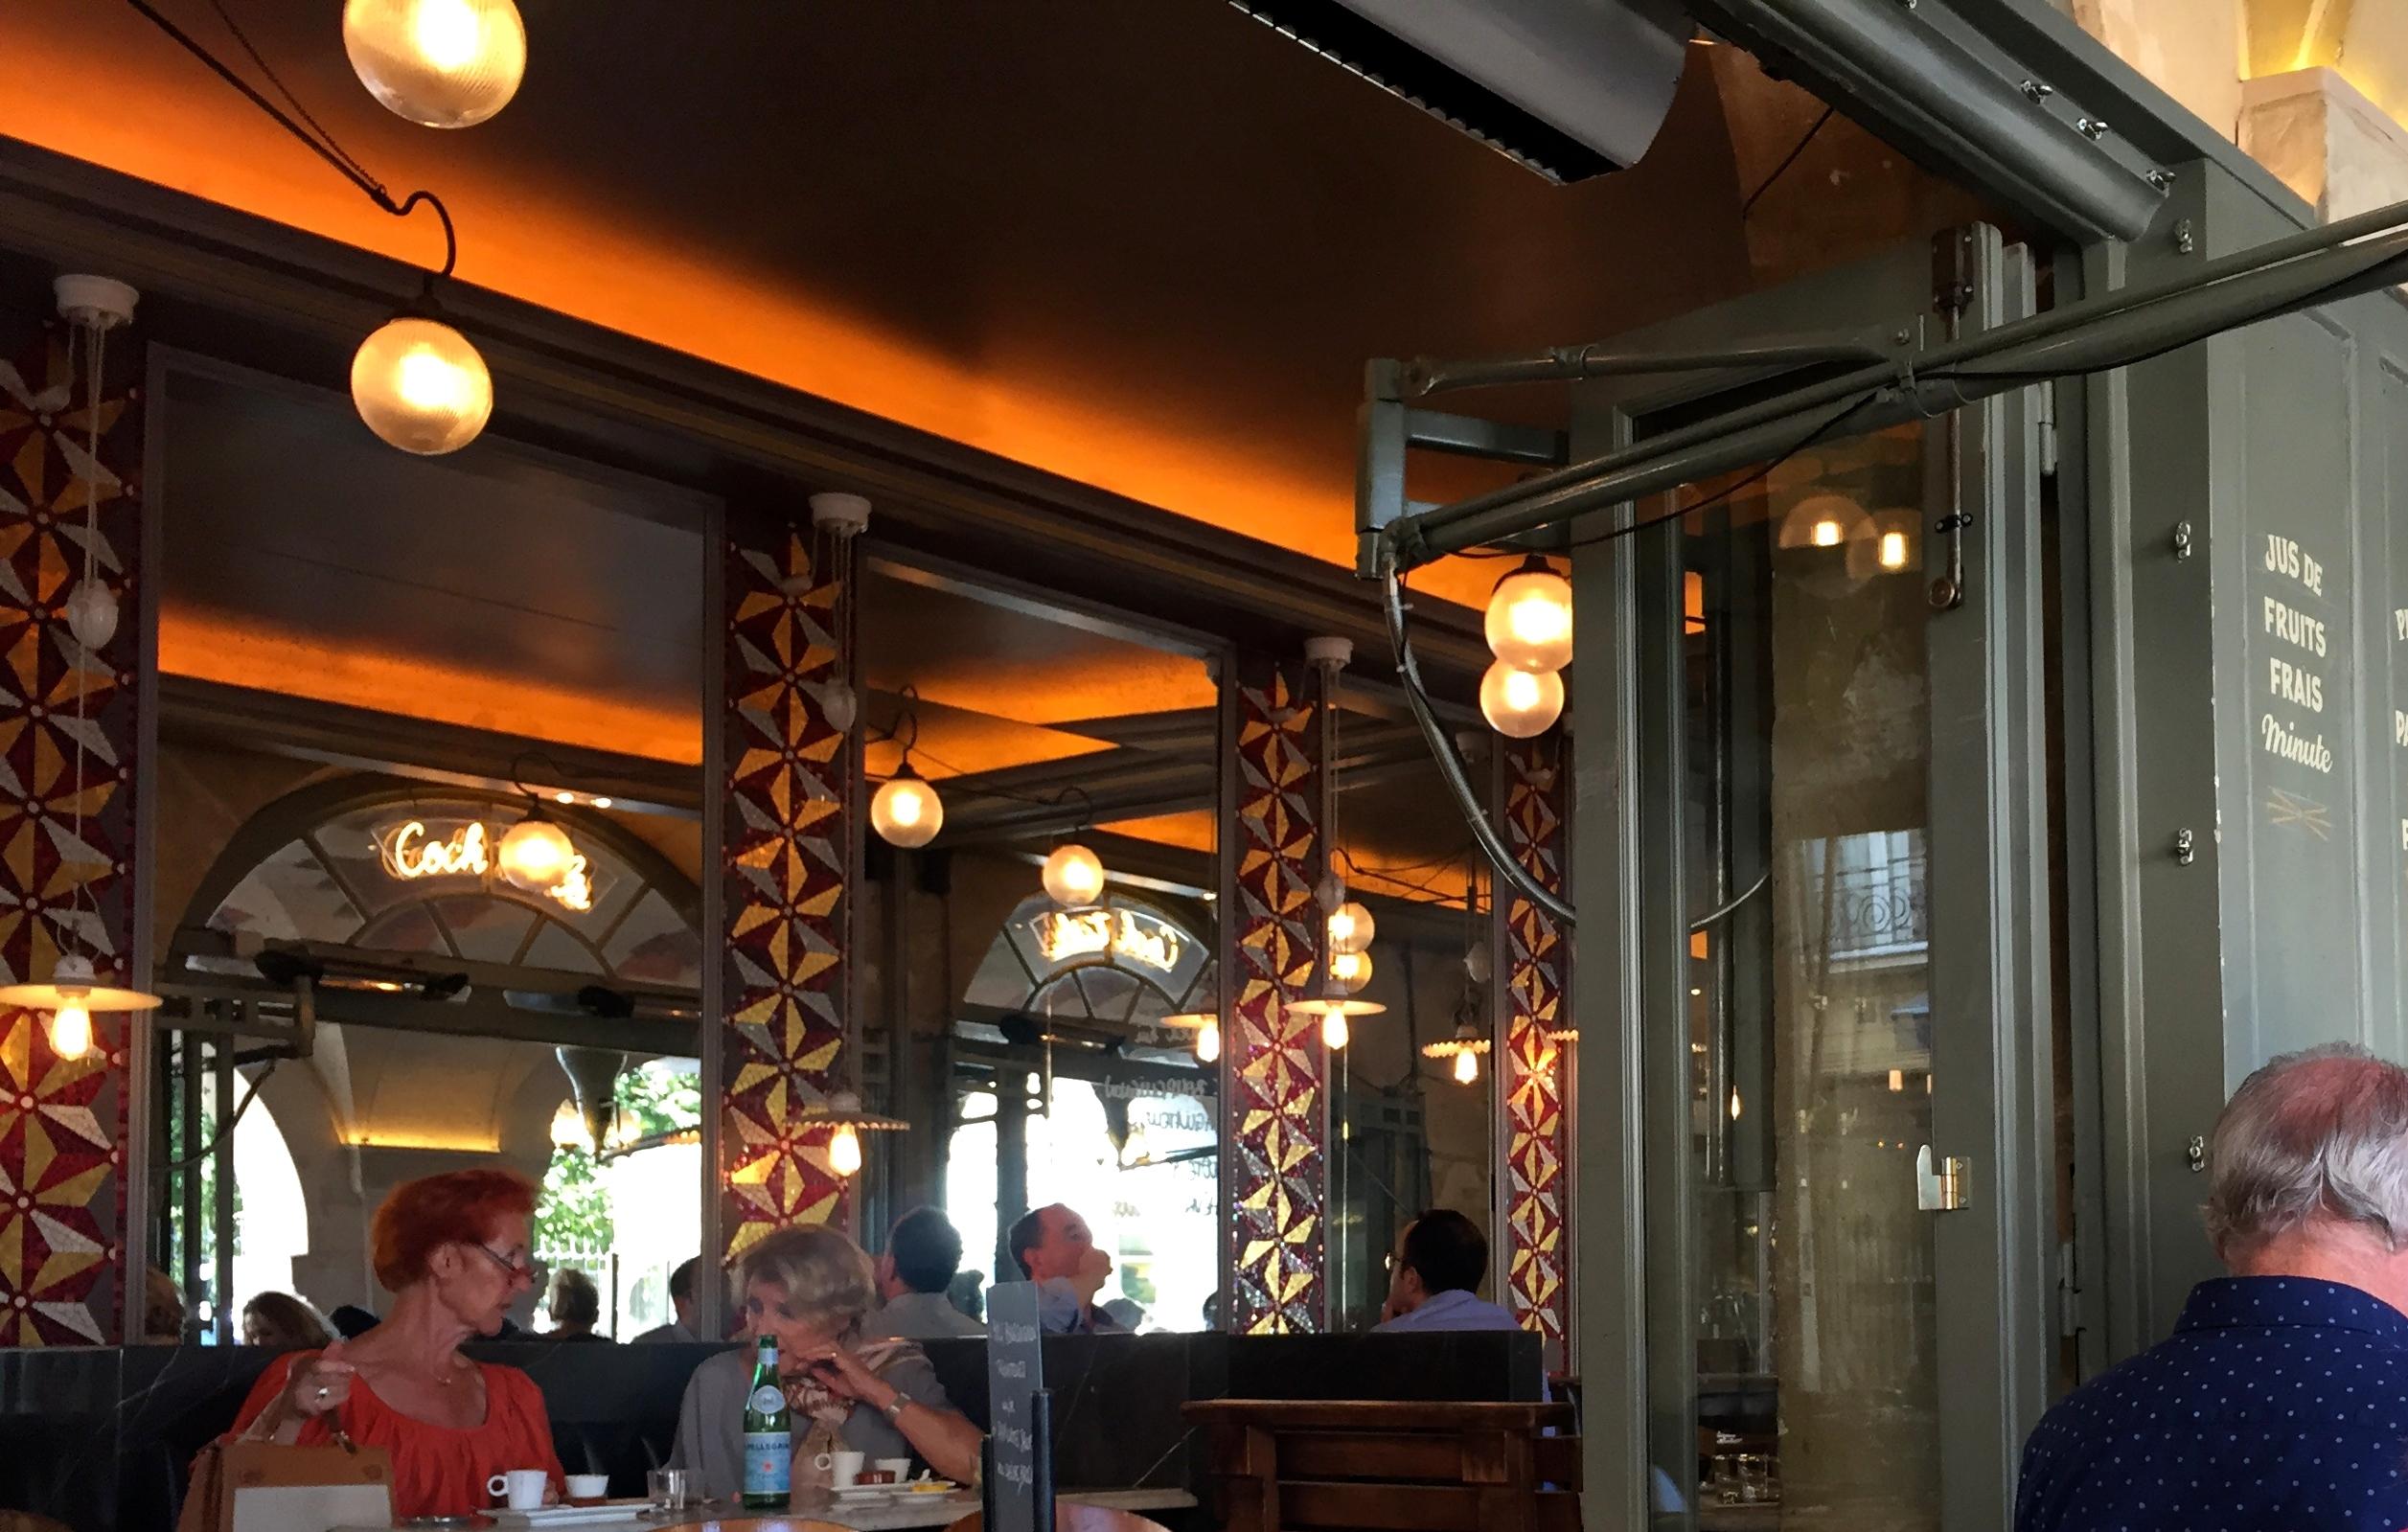 Instantánea tomada en el Café Hugo, en Place des Vosges